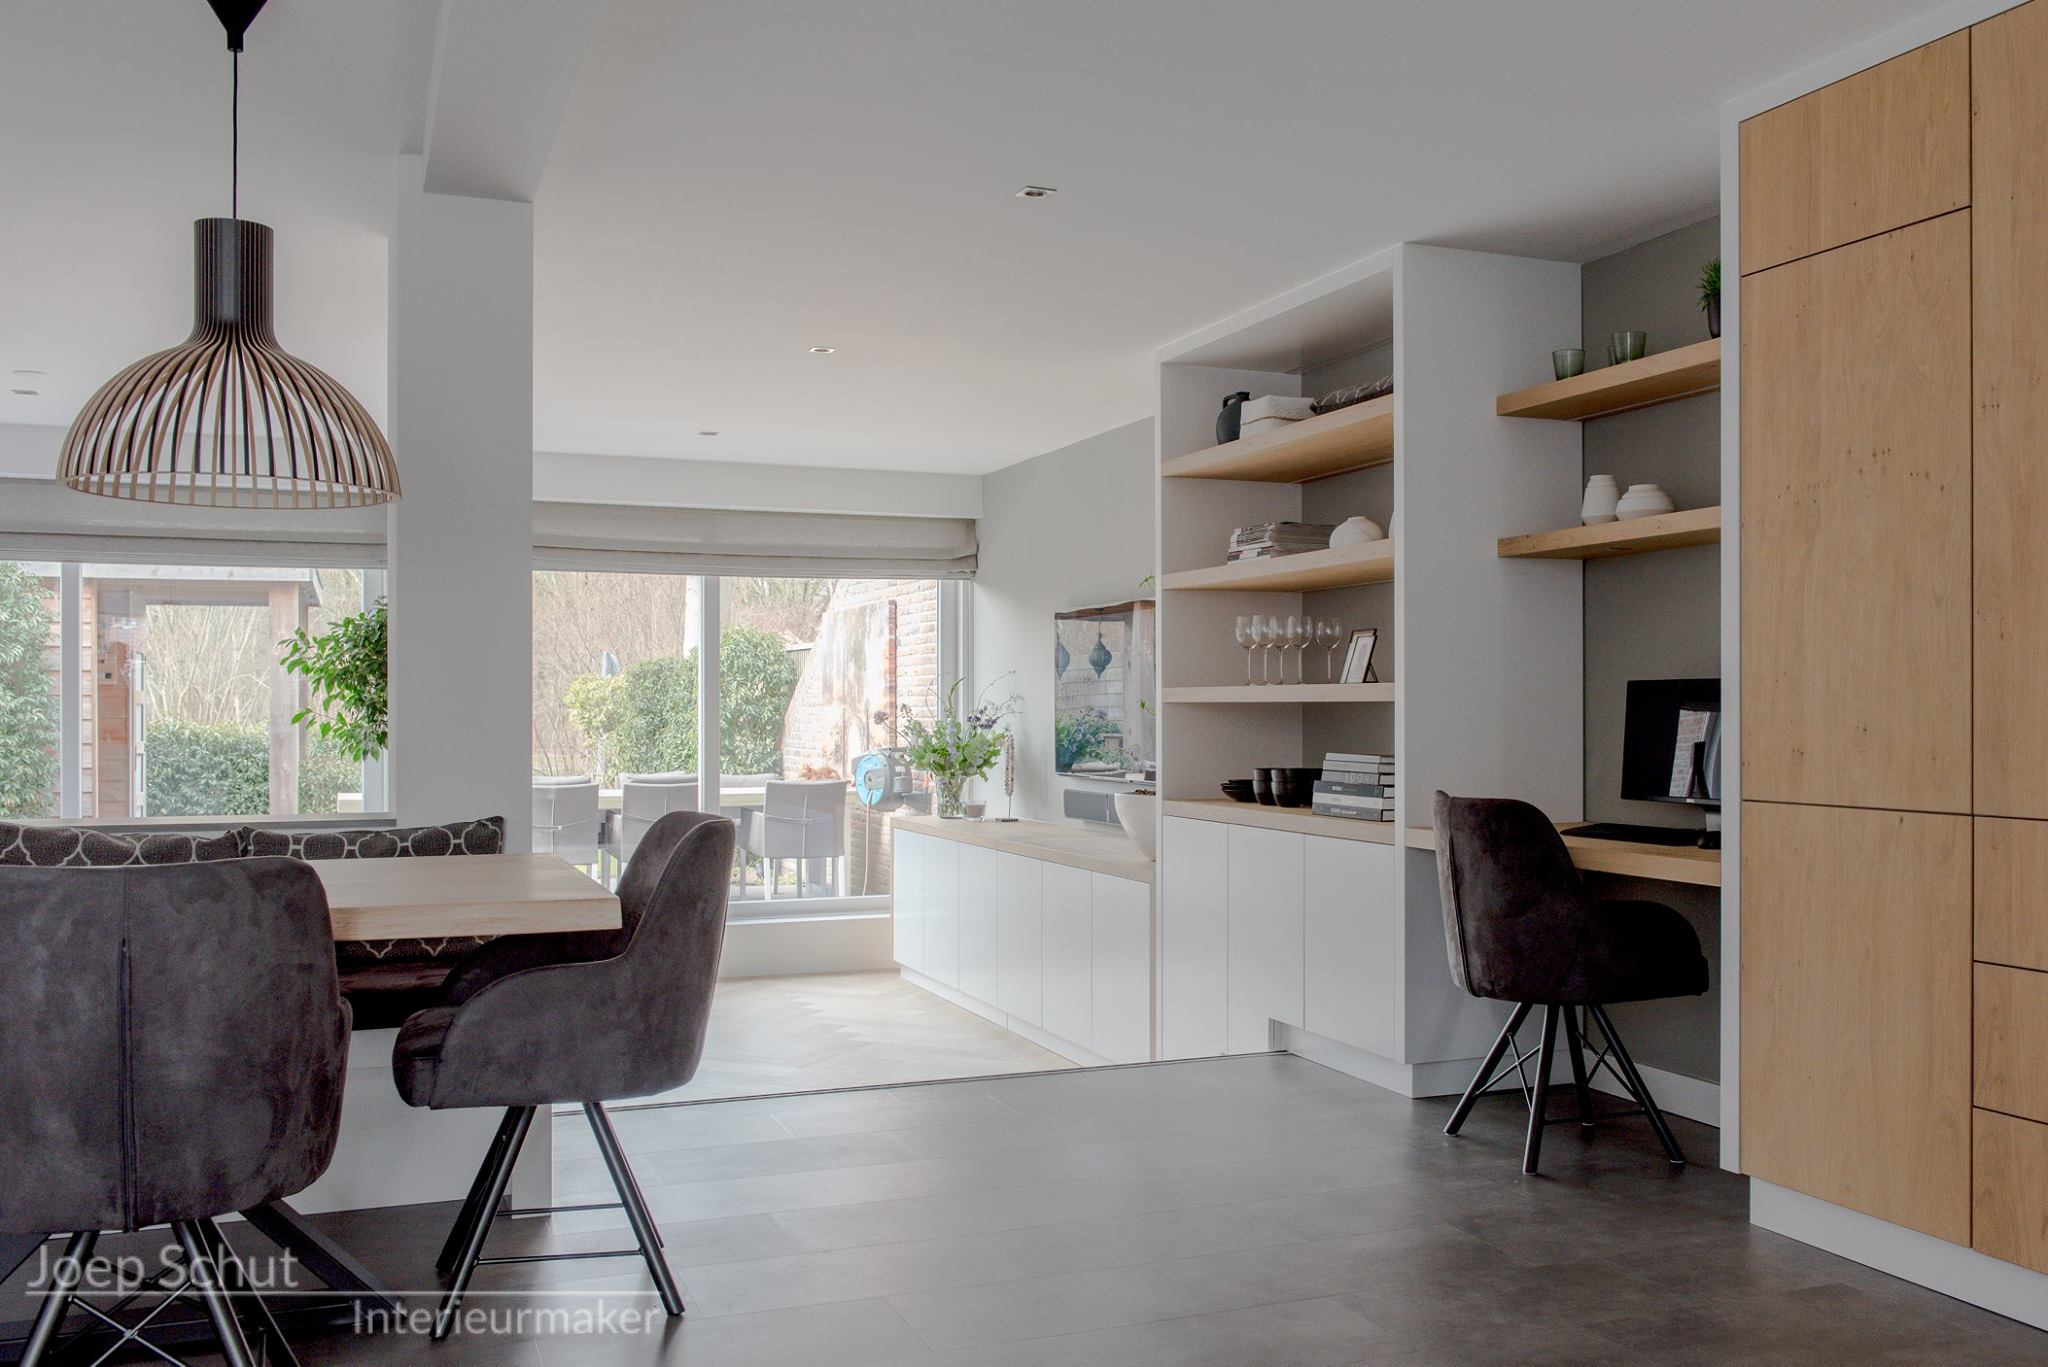 Kasten Woonkamer Interieur : Project heiloo handgemaakte keuken en interieur woonkamer